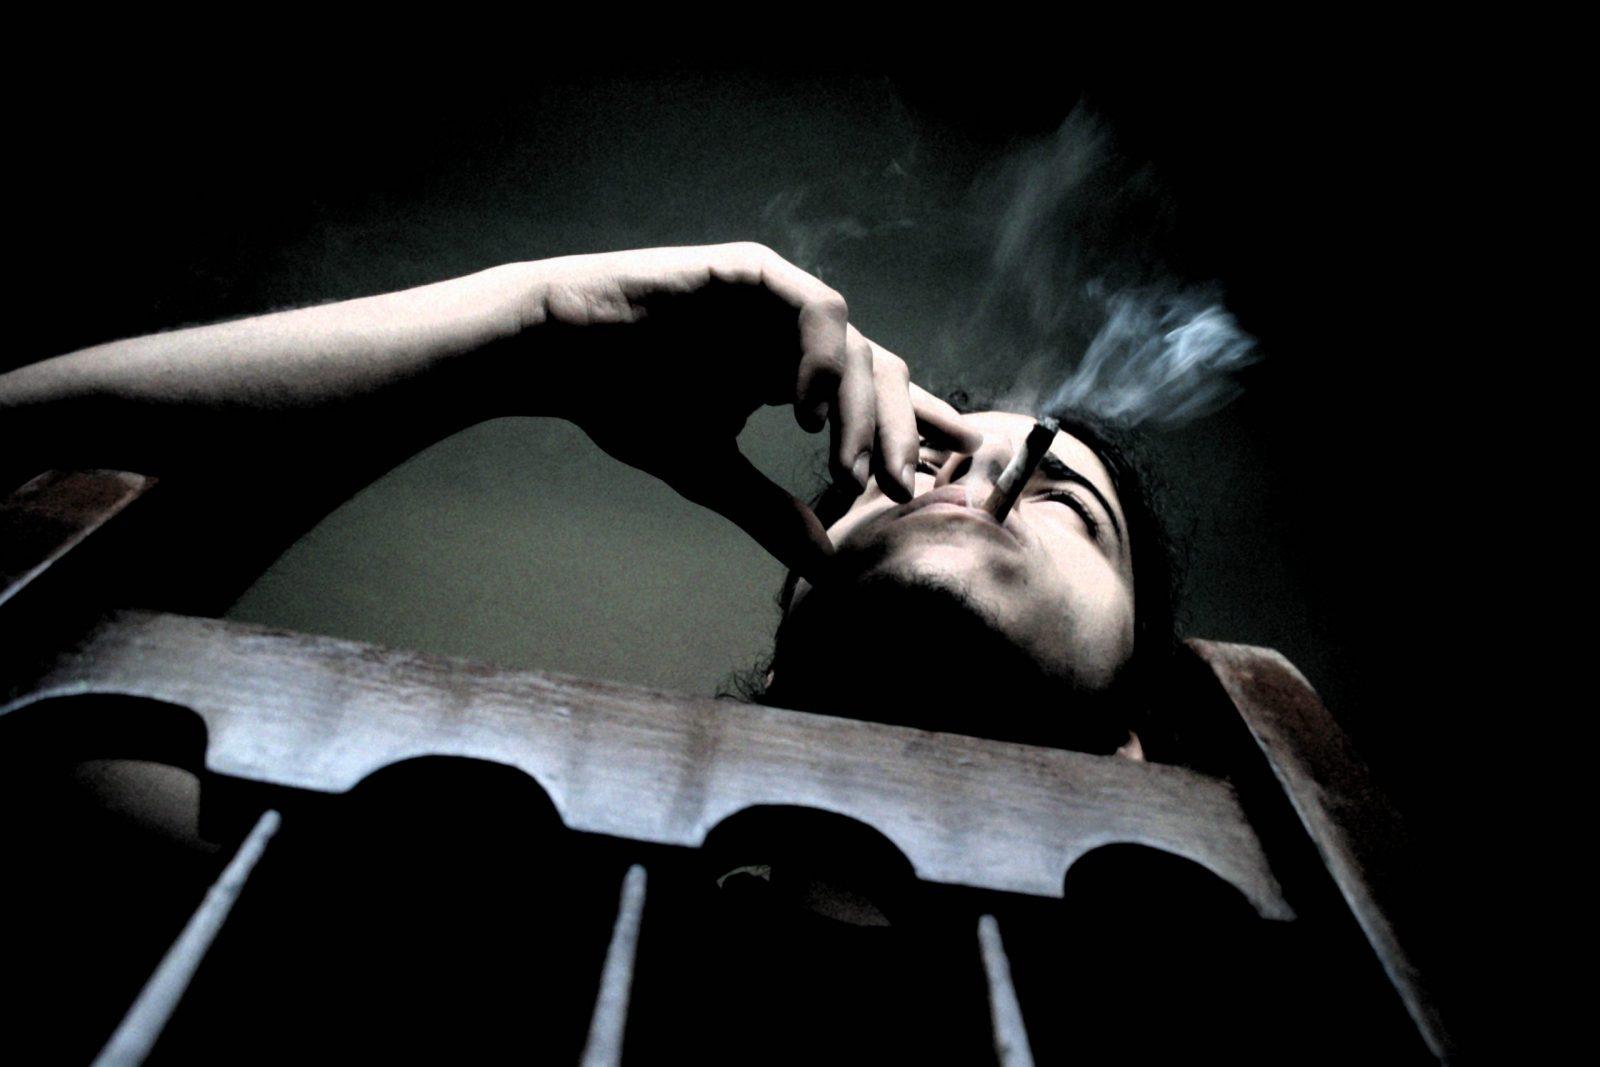 does aga matter when smoking weed